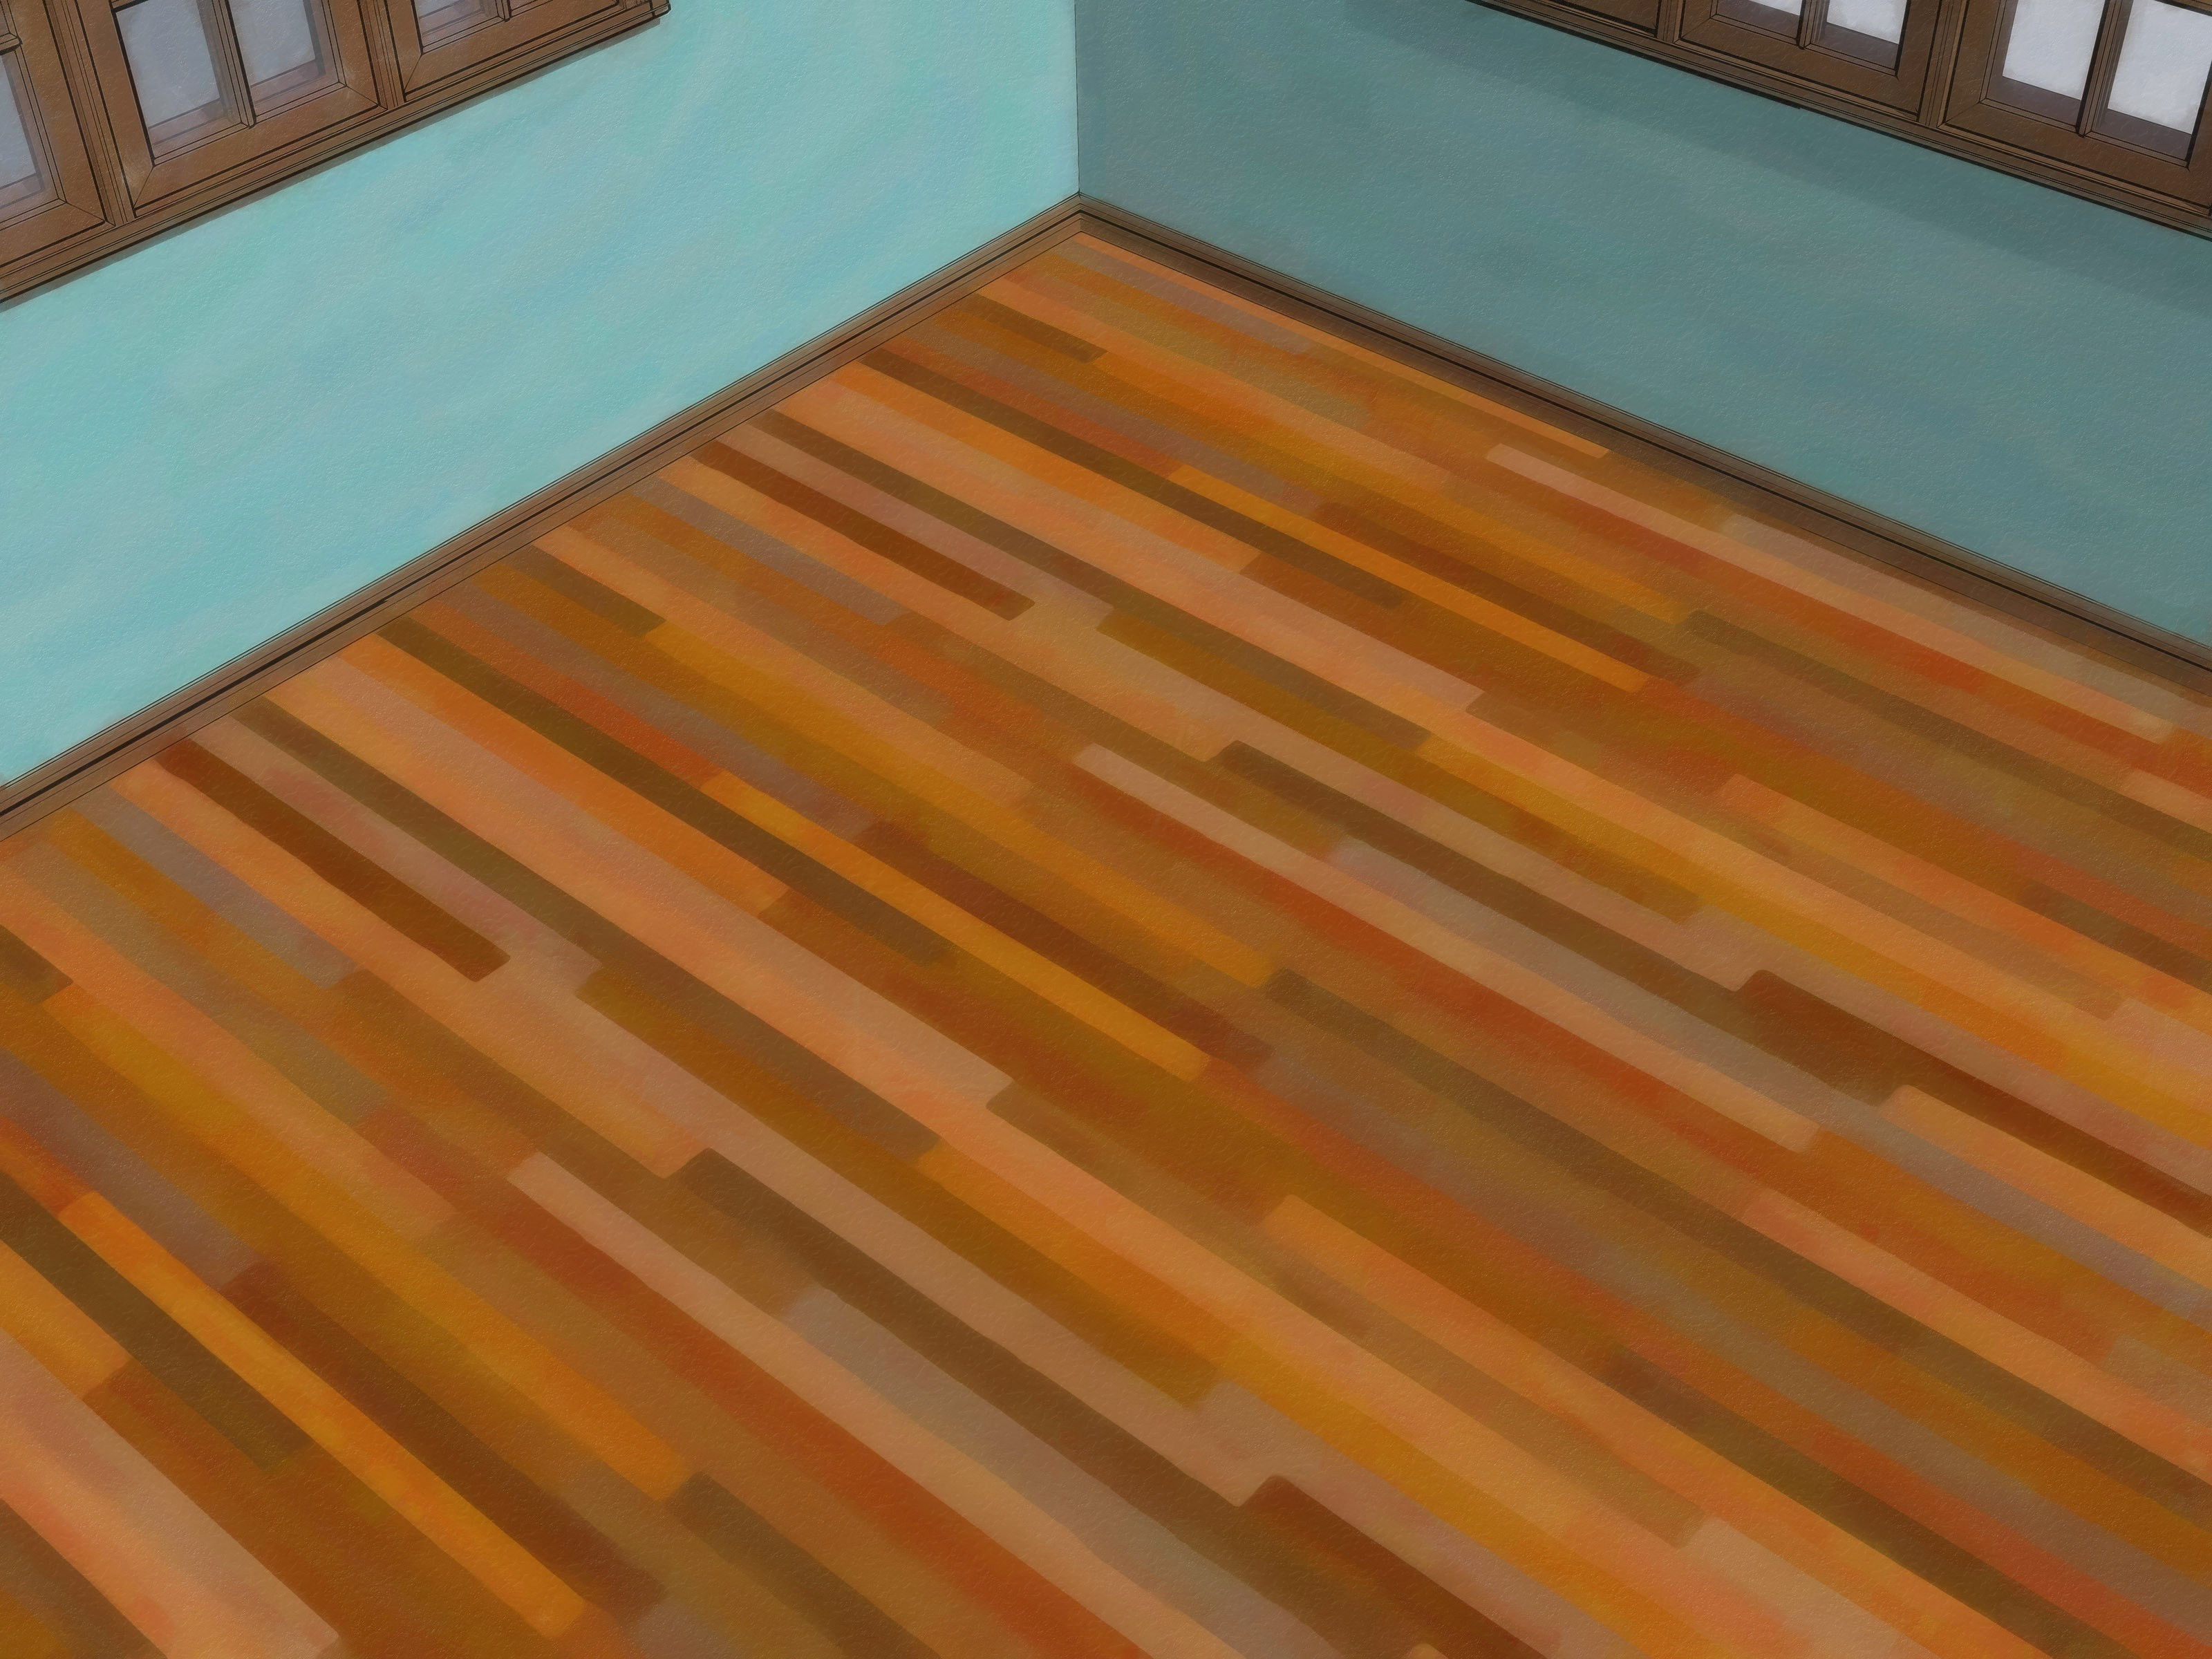 how much does hardwood floor refinishing cost sq ft of 16 fresh hardwood floor polish photos dizpos com throughout hardwood floor polish unique 50 inspirational sanding and refinishing hardwood floors graphics pics of 16 fresh